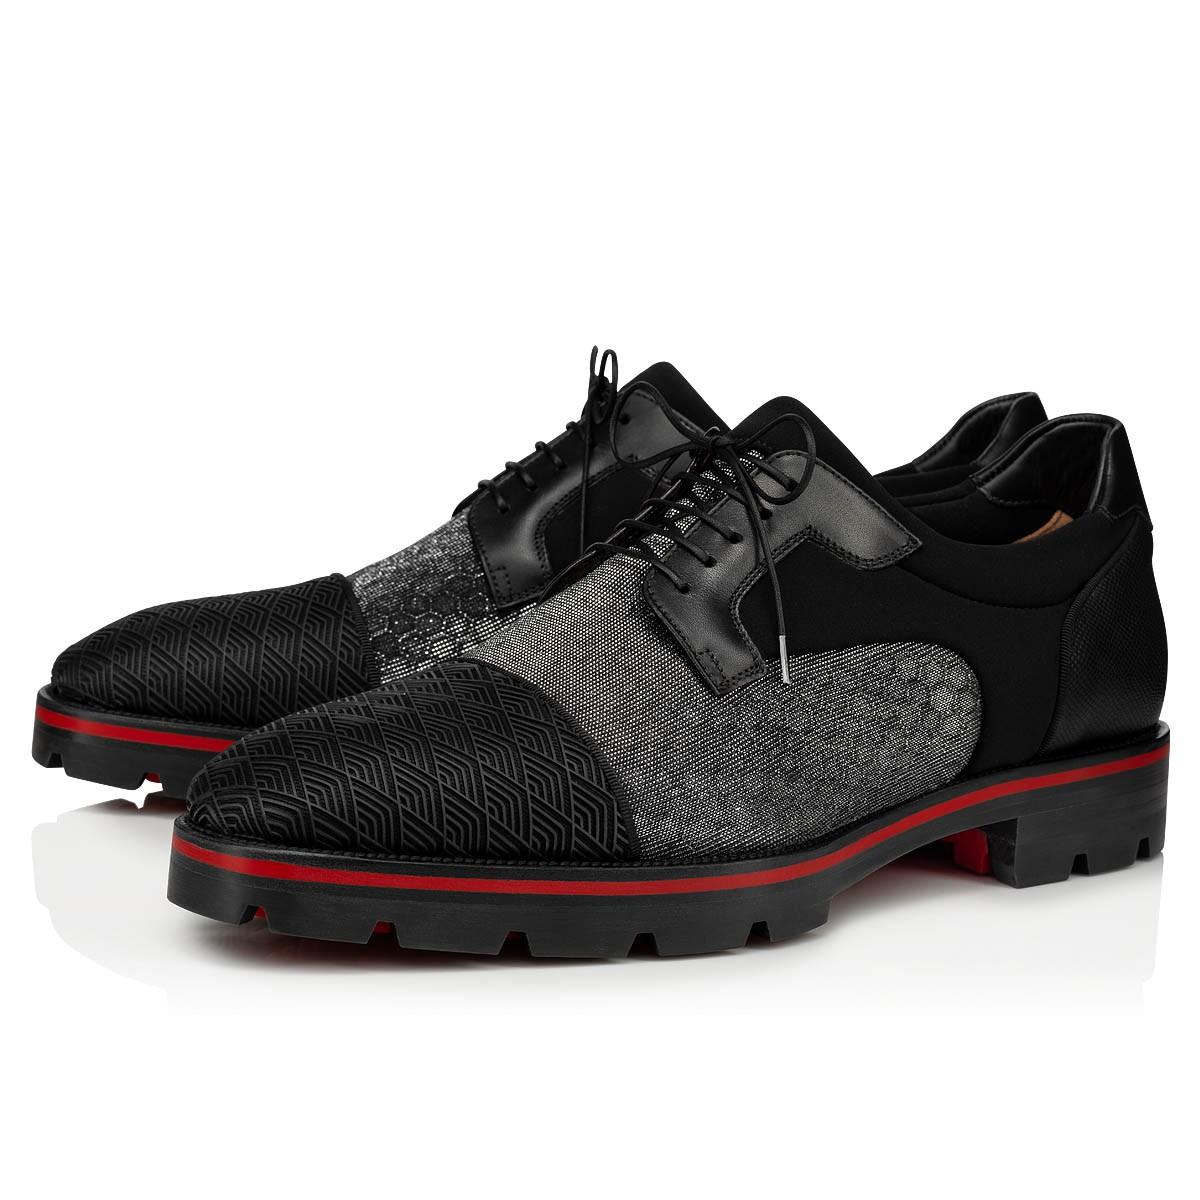 Shoes - Mika Sky Flat - Christian Louboutin